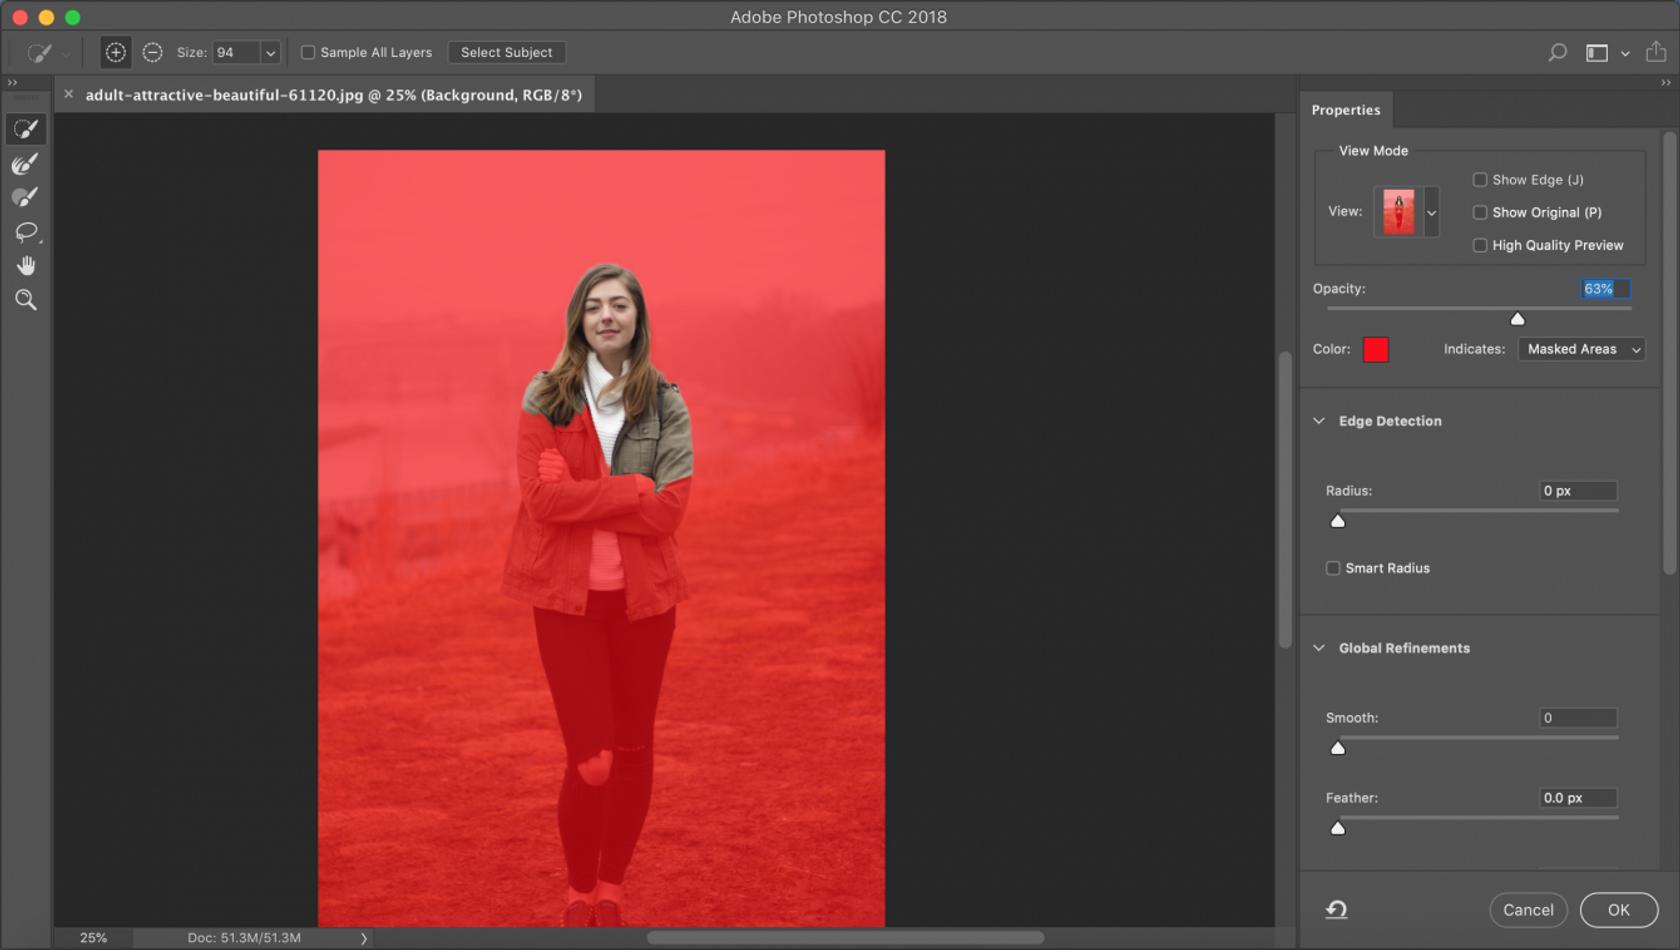 como suavizar bordes de imagen en photoshop, como suavizar bordes de una imagen recortada en photoshop, como suavizar los bordes de una foto en photoshop, suavizar bordes en photoshop, suavizar bordes en photoshop cs6